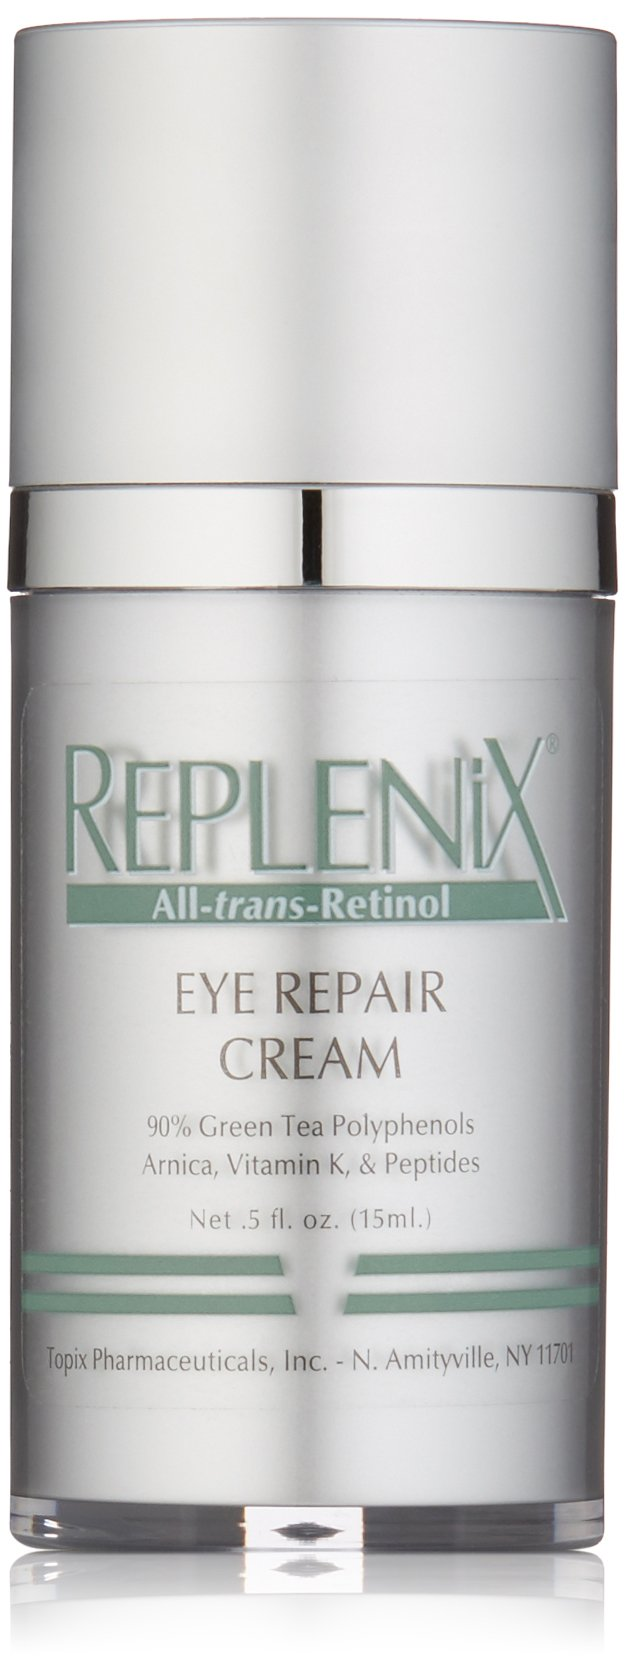 Replenix All-trans-Retinol Eye Repair Cream with Retinol, Vitamin K and Antioxidants, 0.5 Fl oz